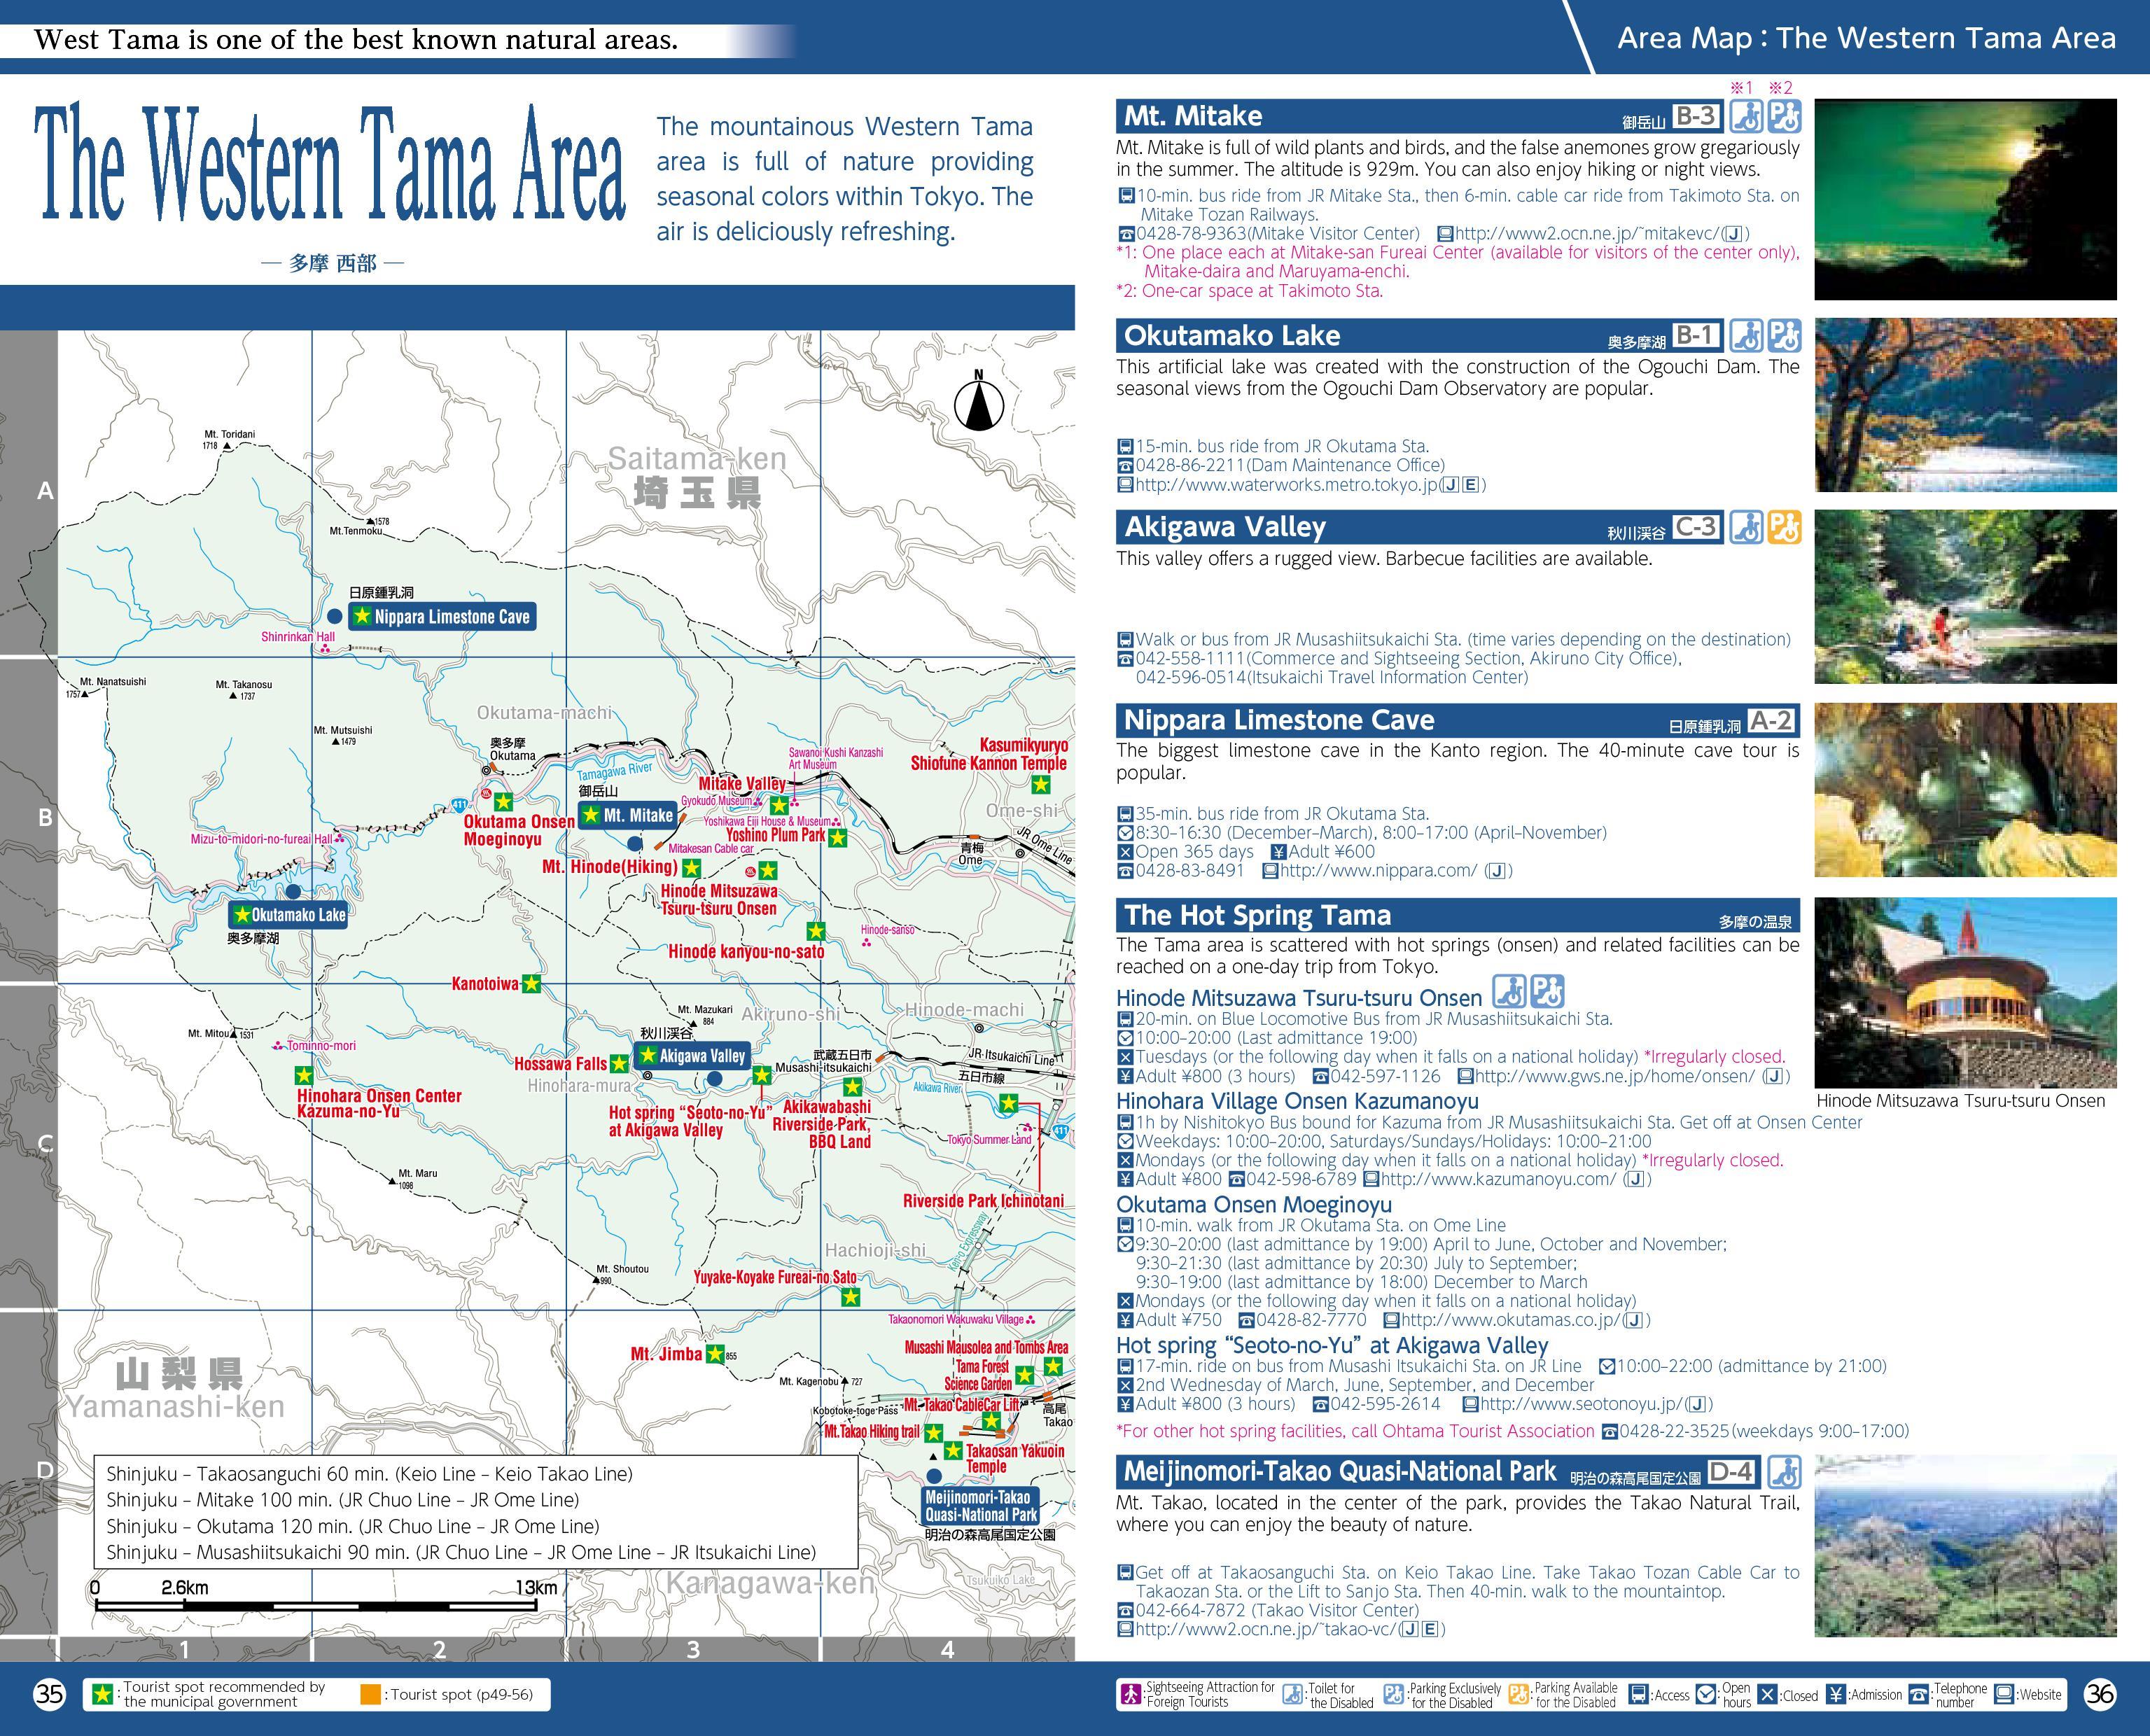 The Western Tama Area map